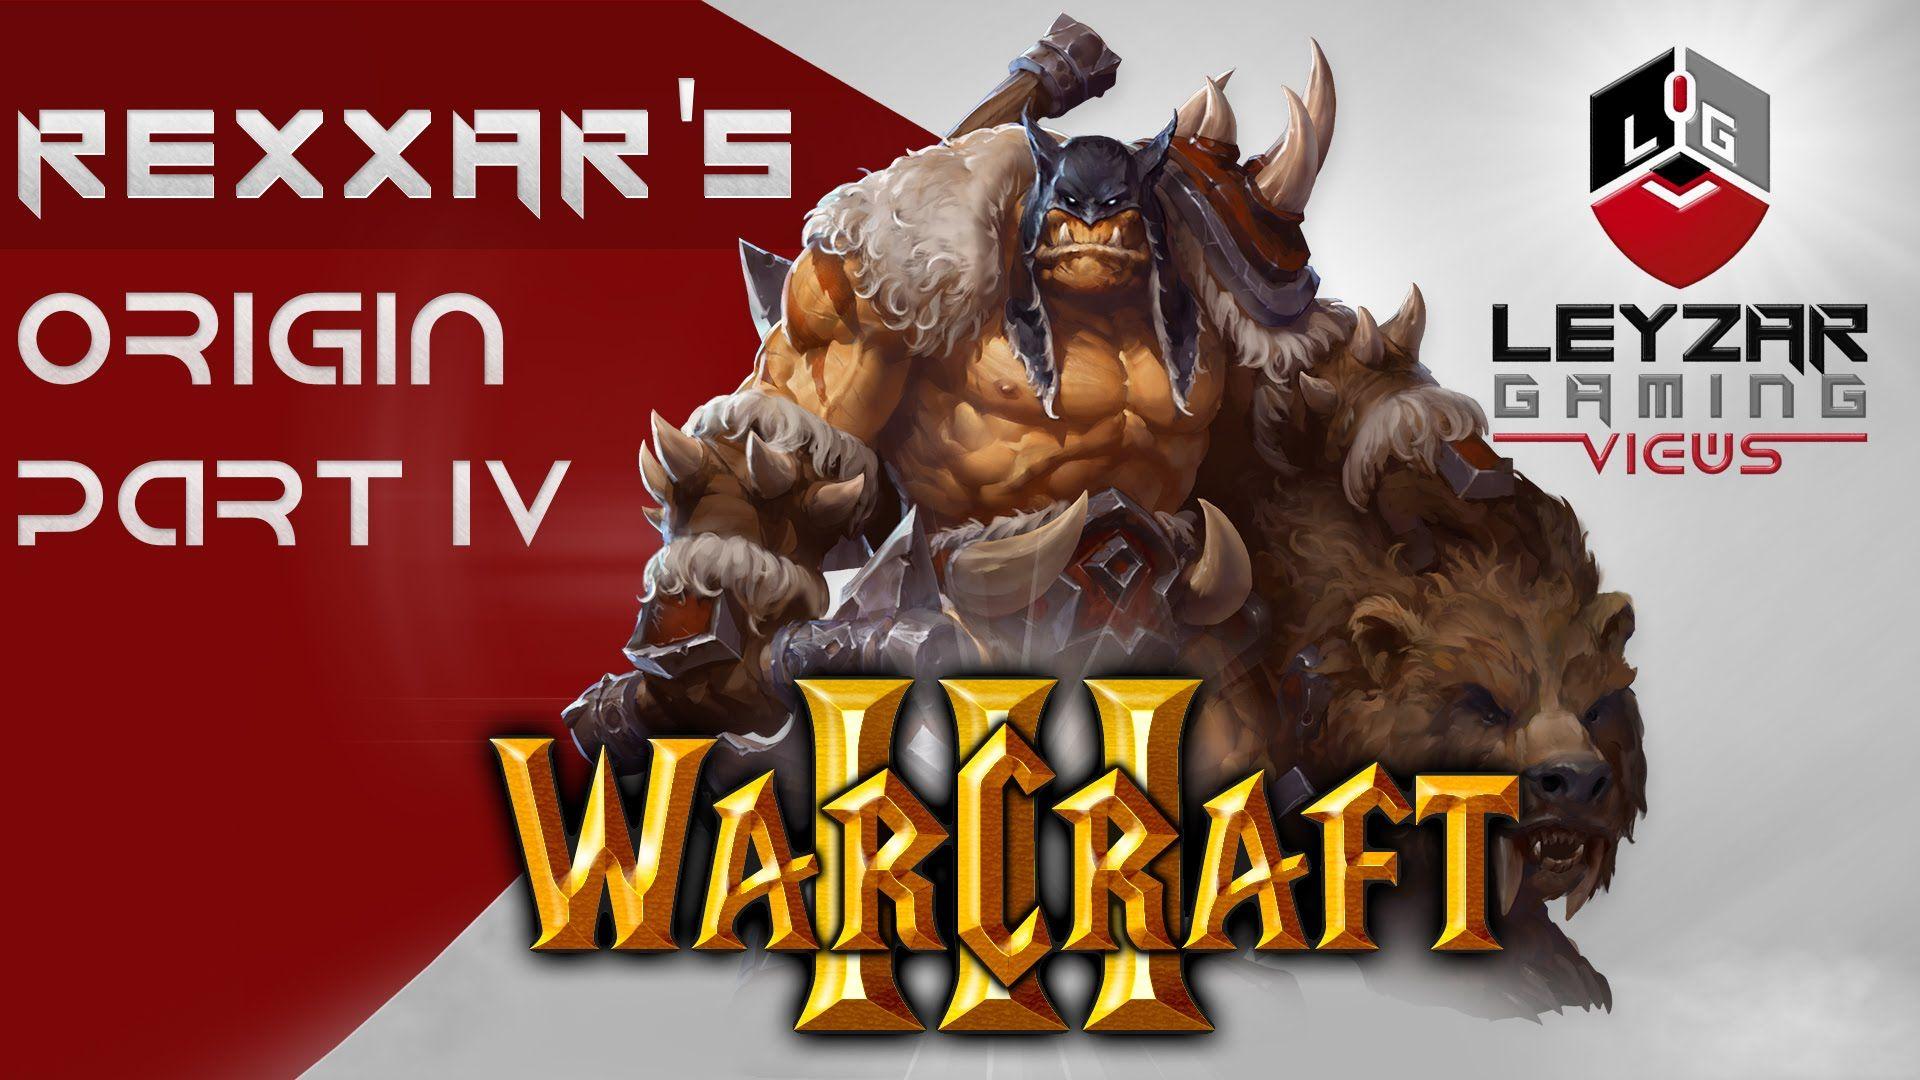 Warcraft 3 (Gameplay) - Rexxar's Origin - The Founding of Durotar (To Ta...